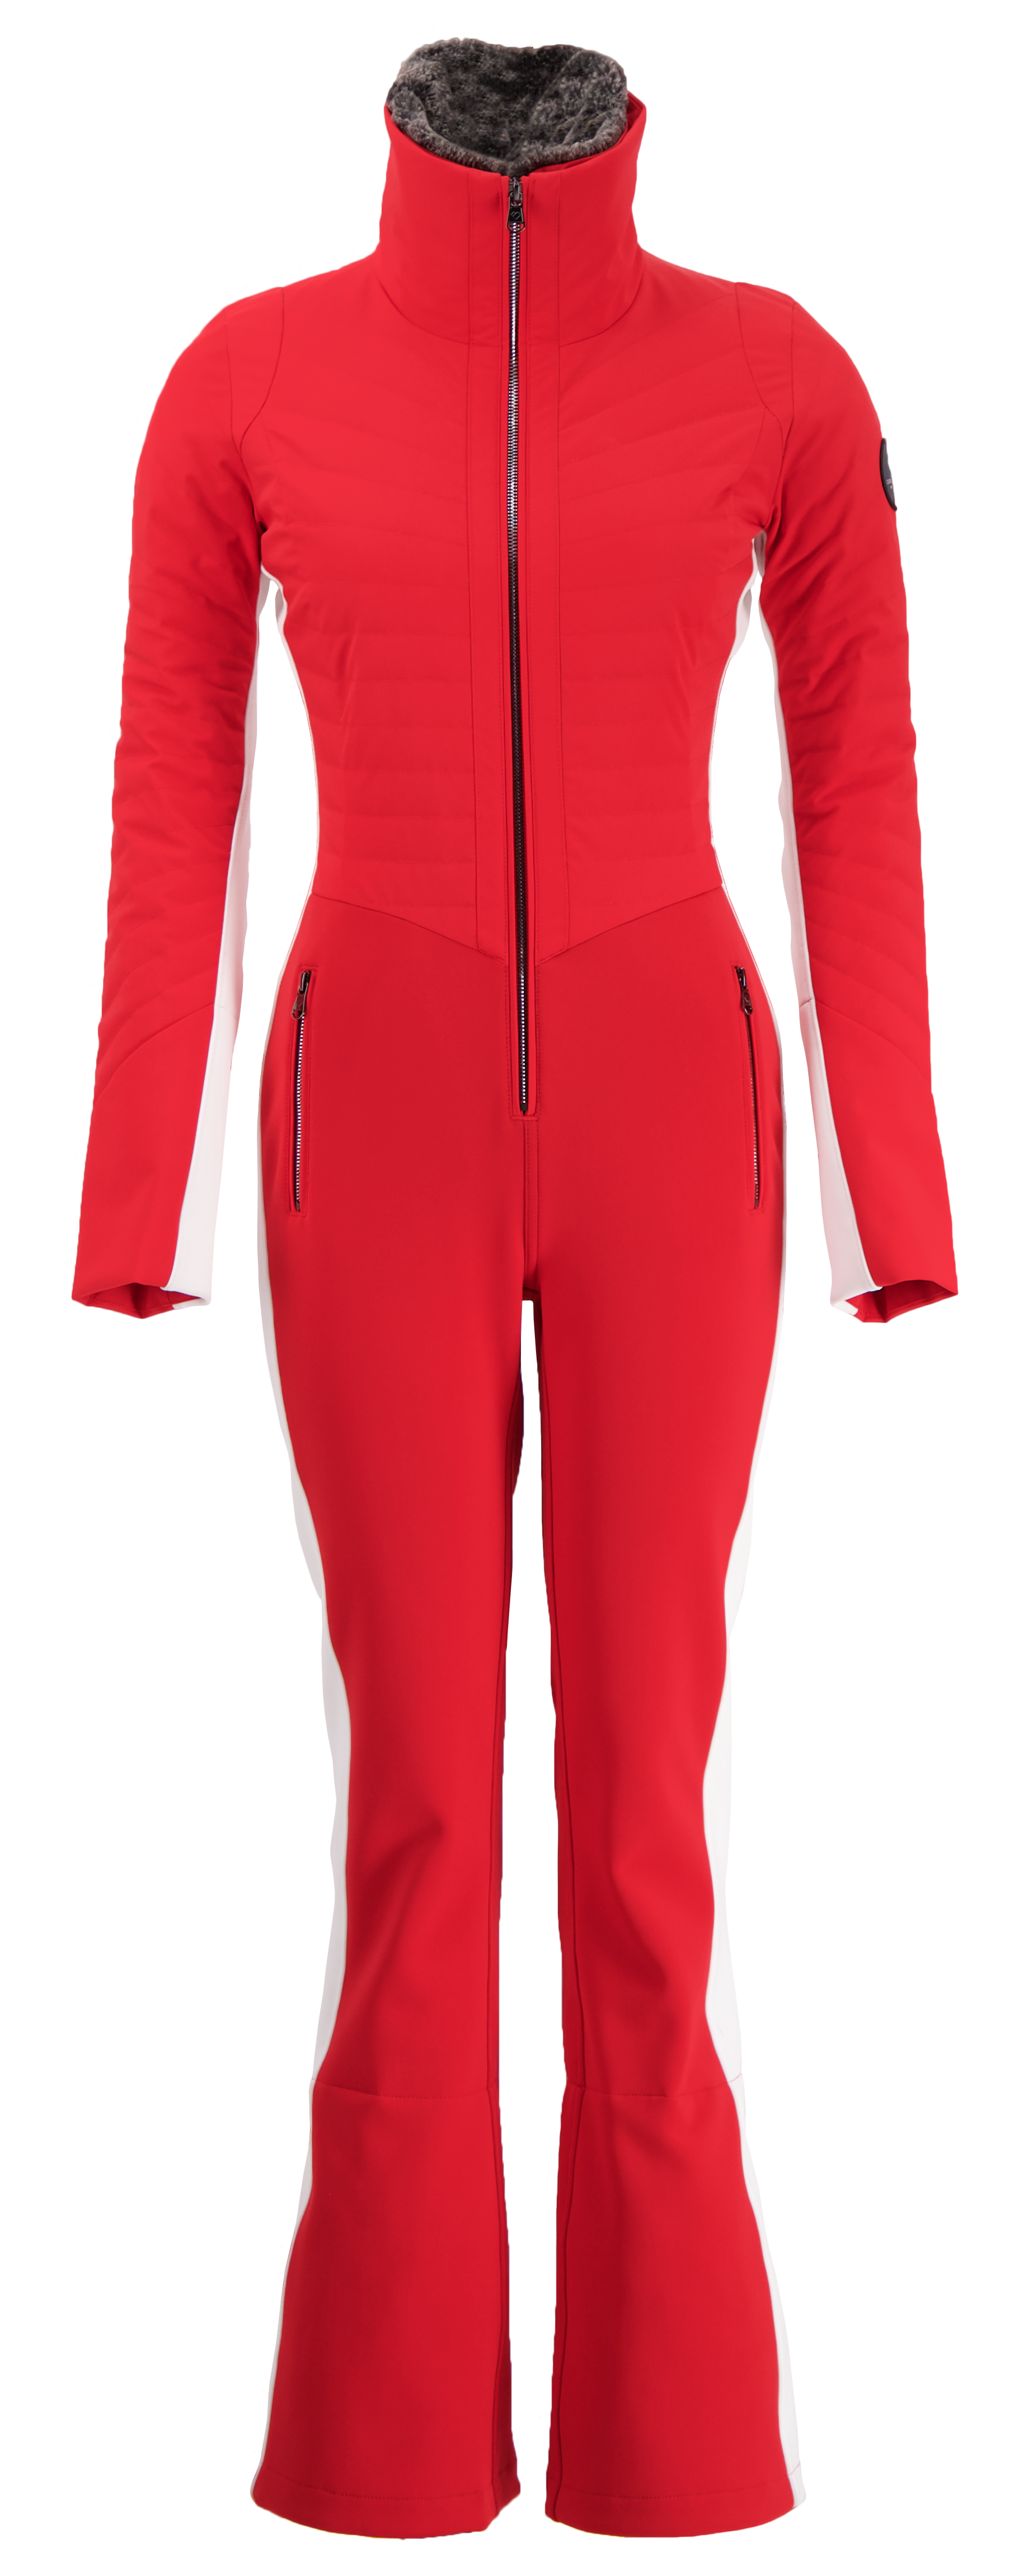 READY TO RIPLANCE WEARS Arc'Teryx Stingray pants, $350; Hestra Vertical Cut freeride gloves, $140